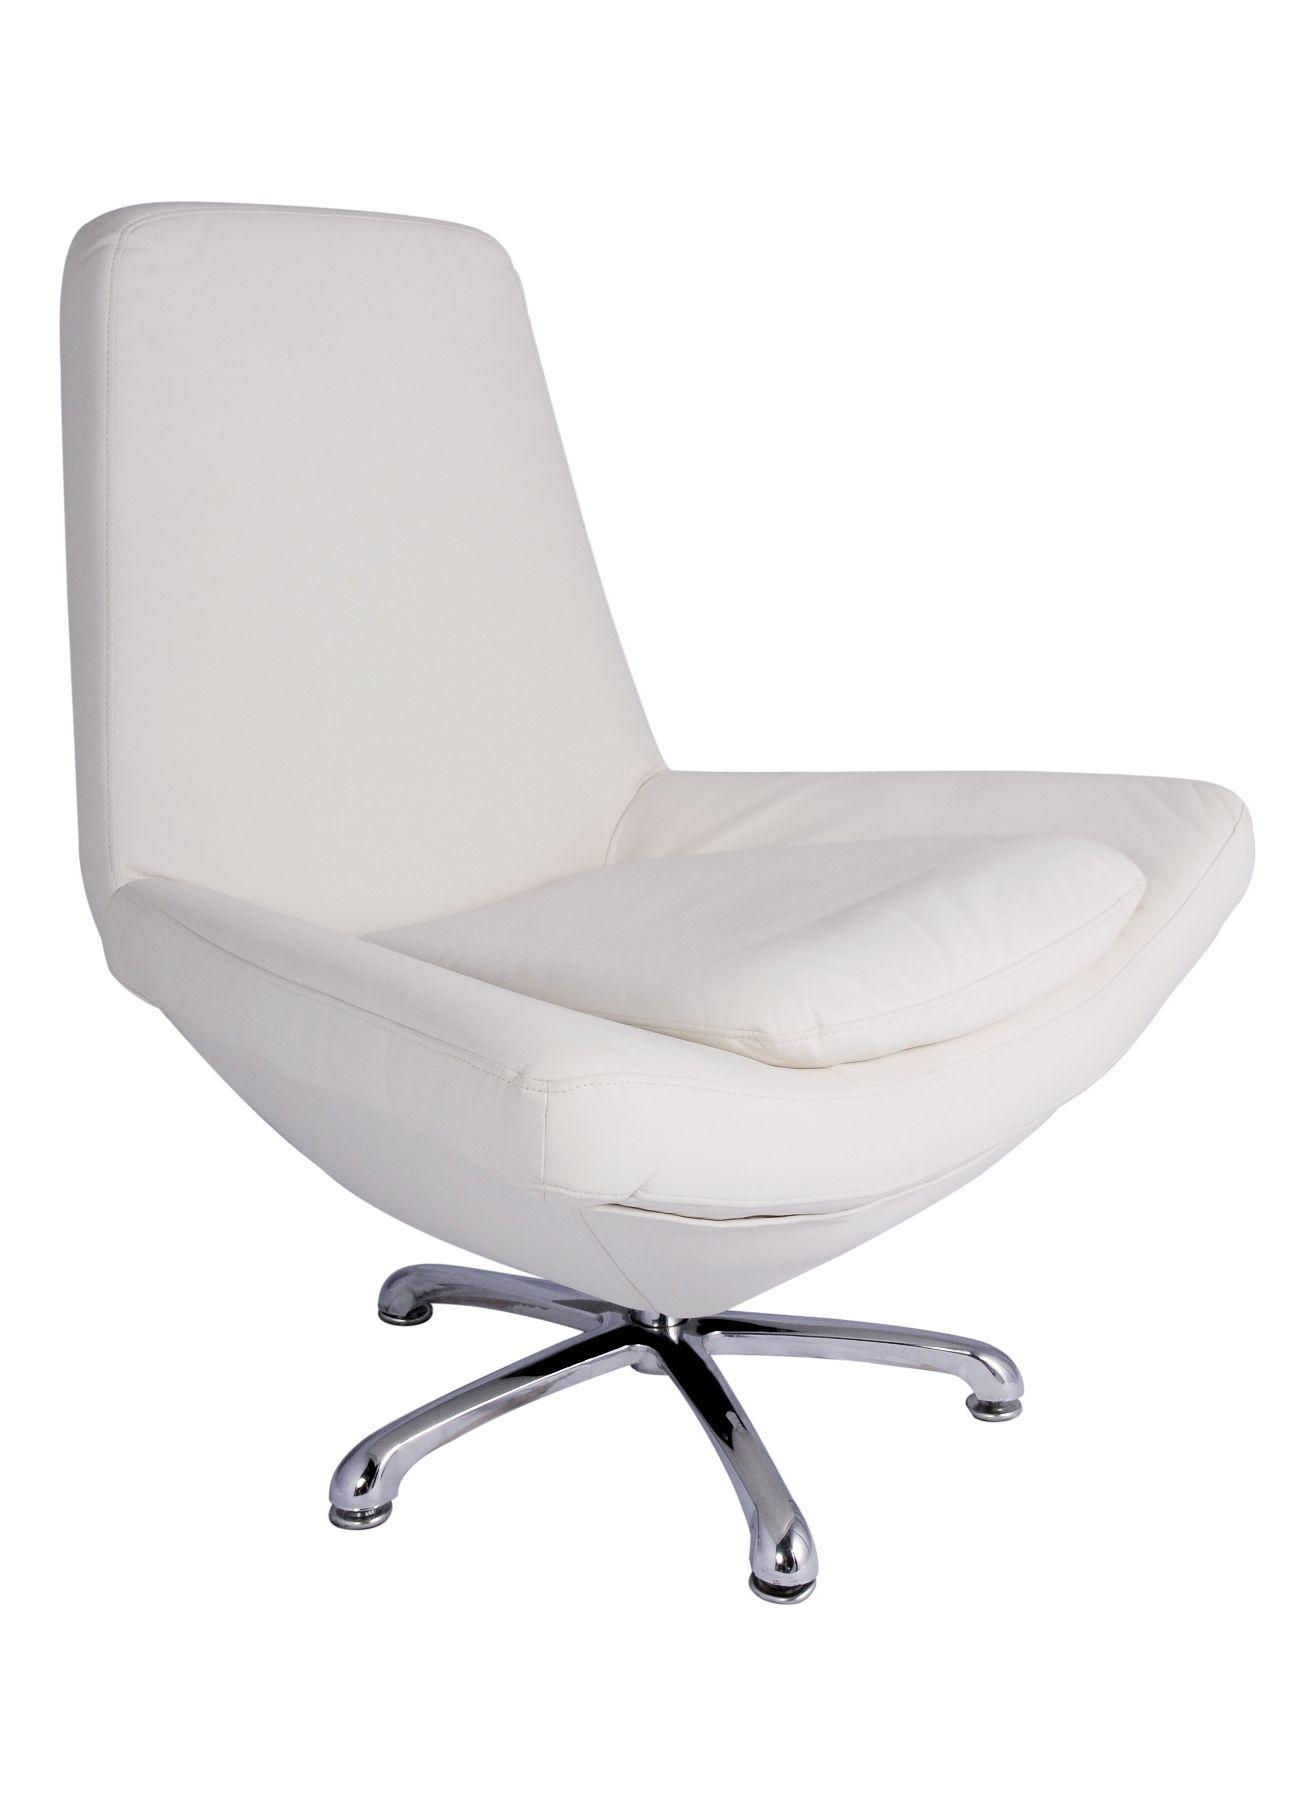 Amsterdam Chair | Desk Chair U2013 Color: Off White Leather U2013 Dimensions: 38u2033